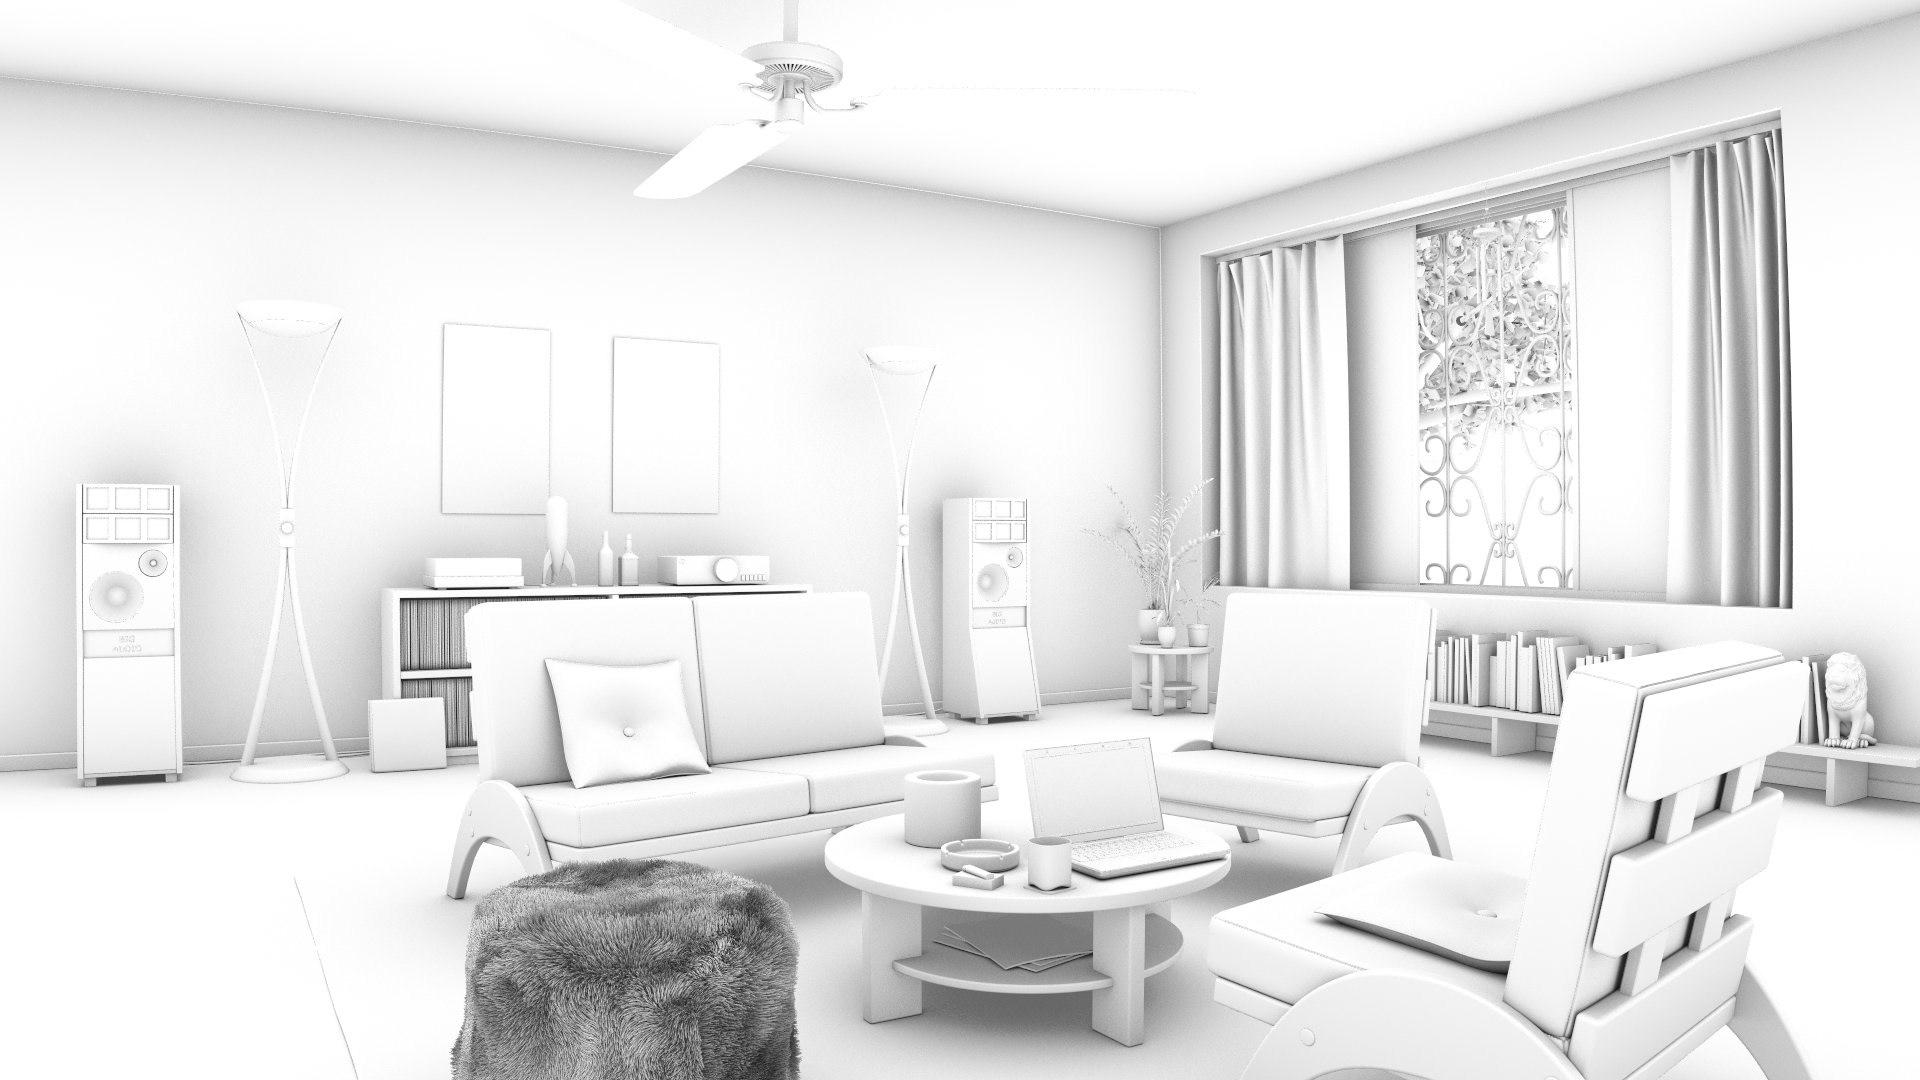 CG LION Studio Portfolio - Retro living-room - day & night